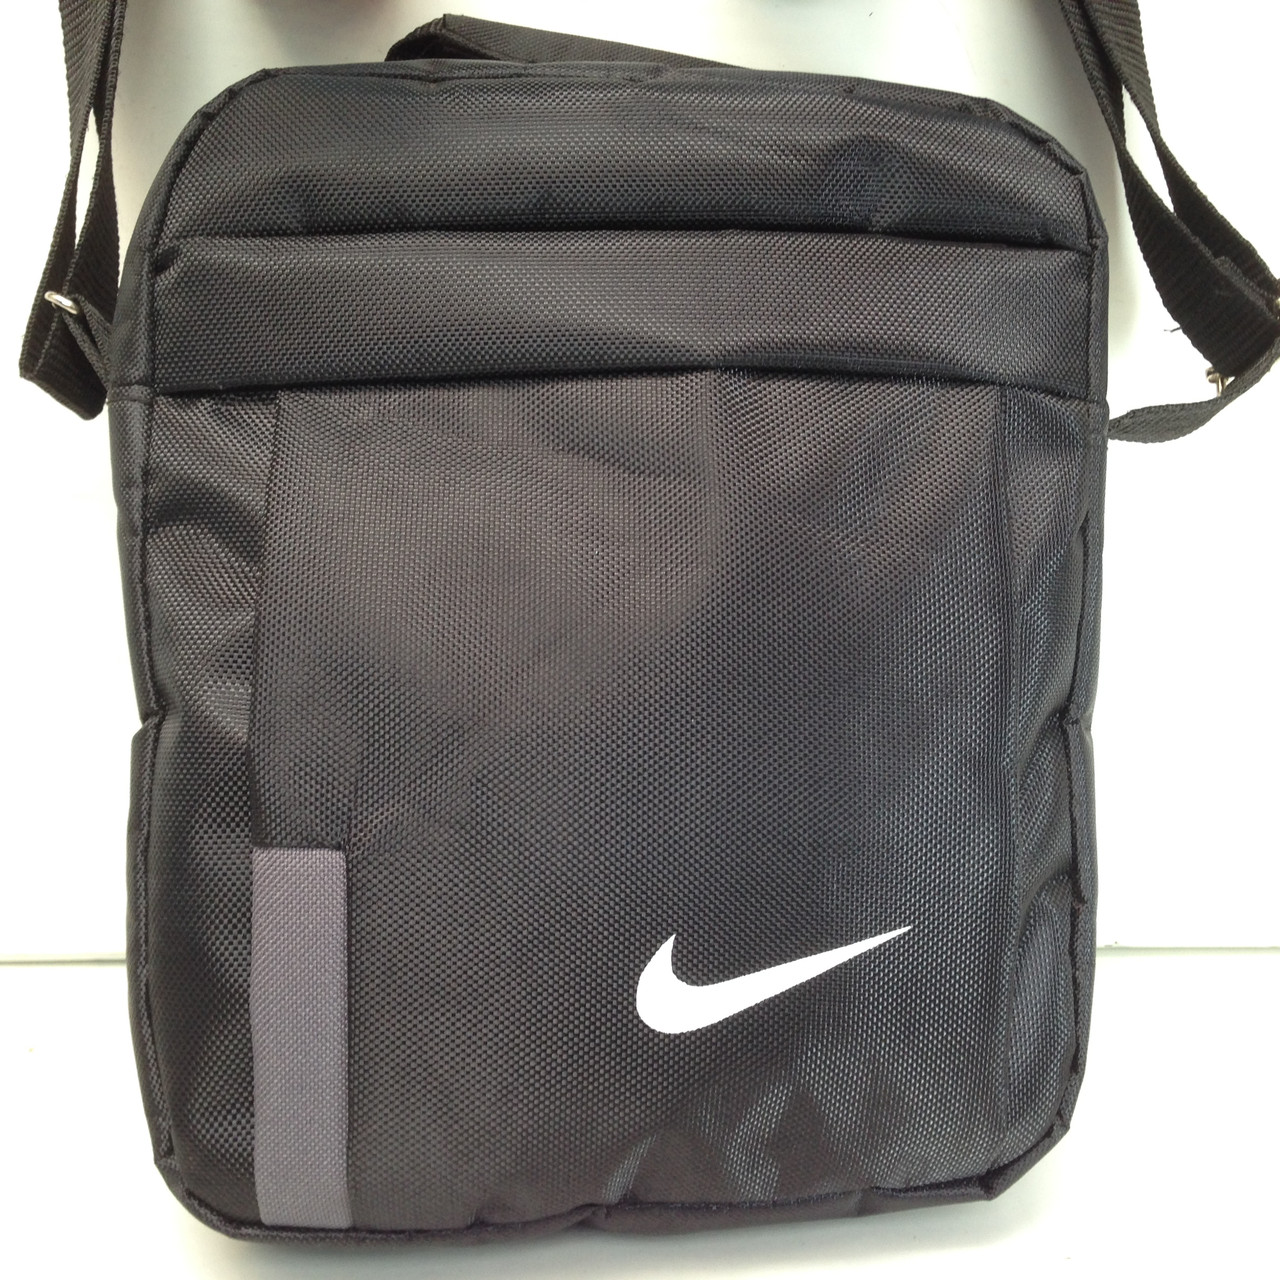 ffc454f8 Сумка спортивная мужская Nike / черная: продажа, цена в Запорожье ...